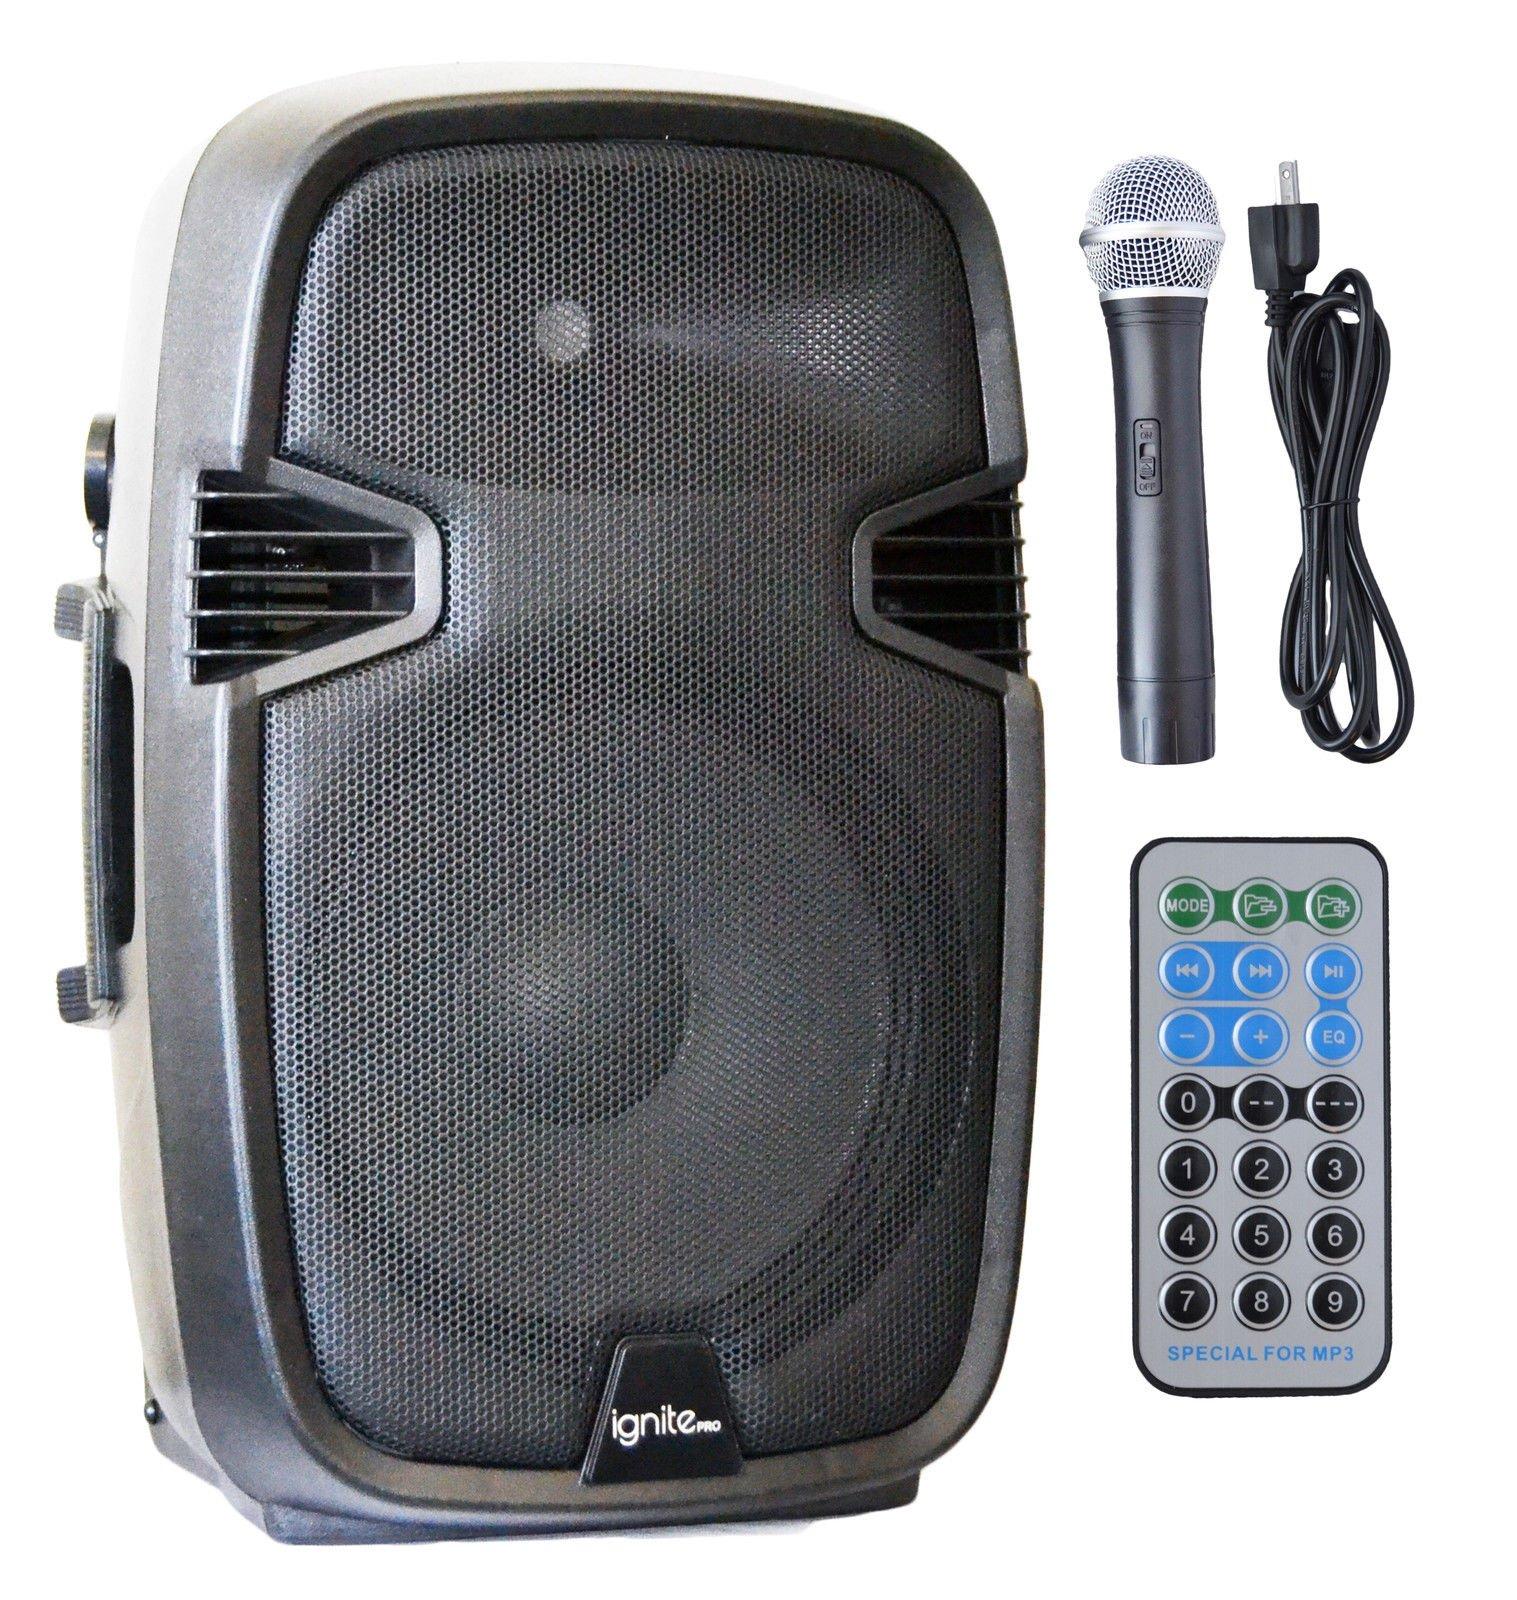 Ignite Pro 12'' Pro Series Speaker DJ / PA System / Bluetooth Connectivity 1800W by Ignite Pro